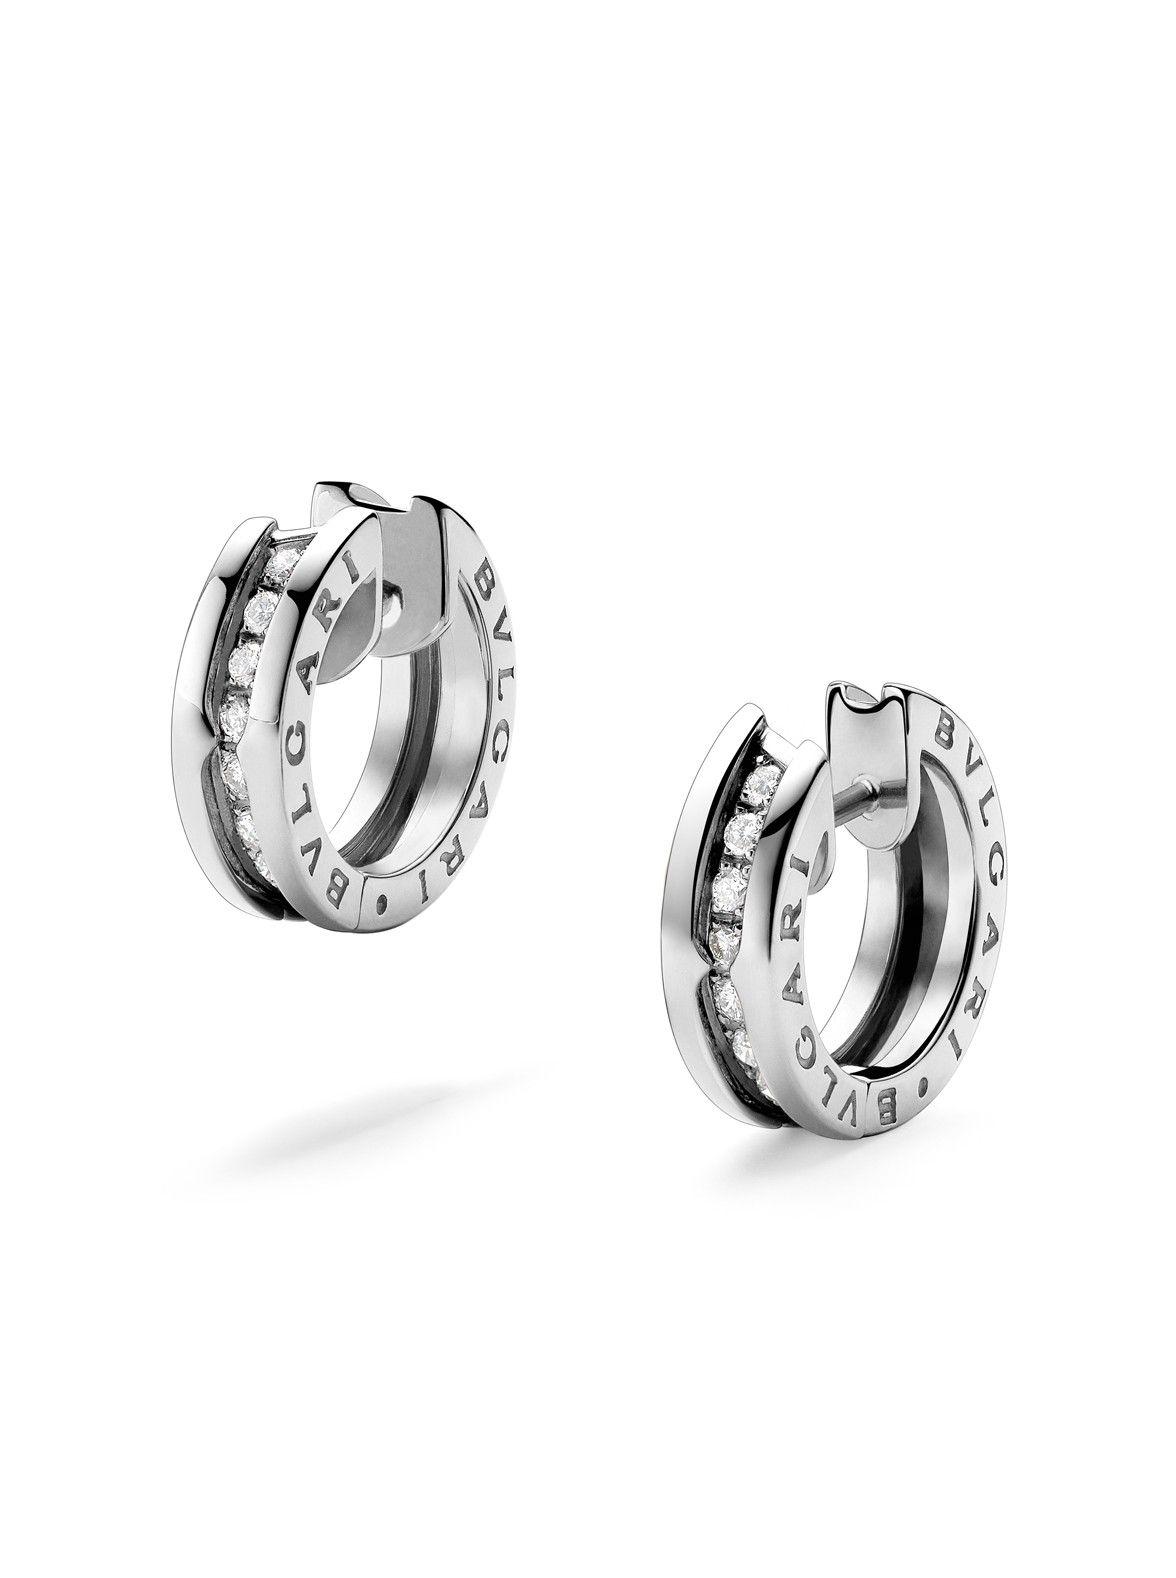 bvlgari white gold small earrings at london jewelers